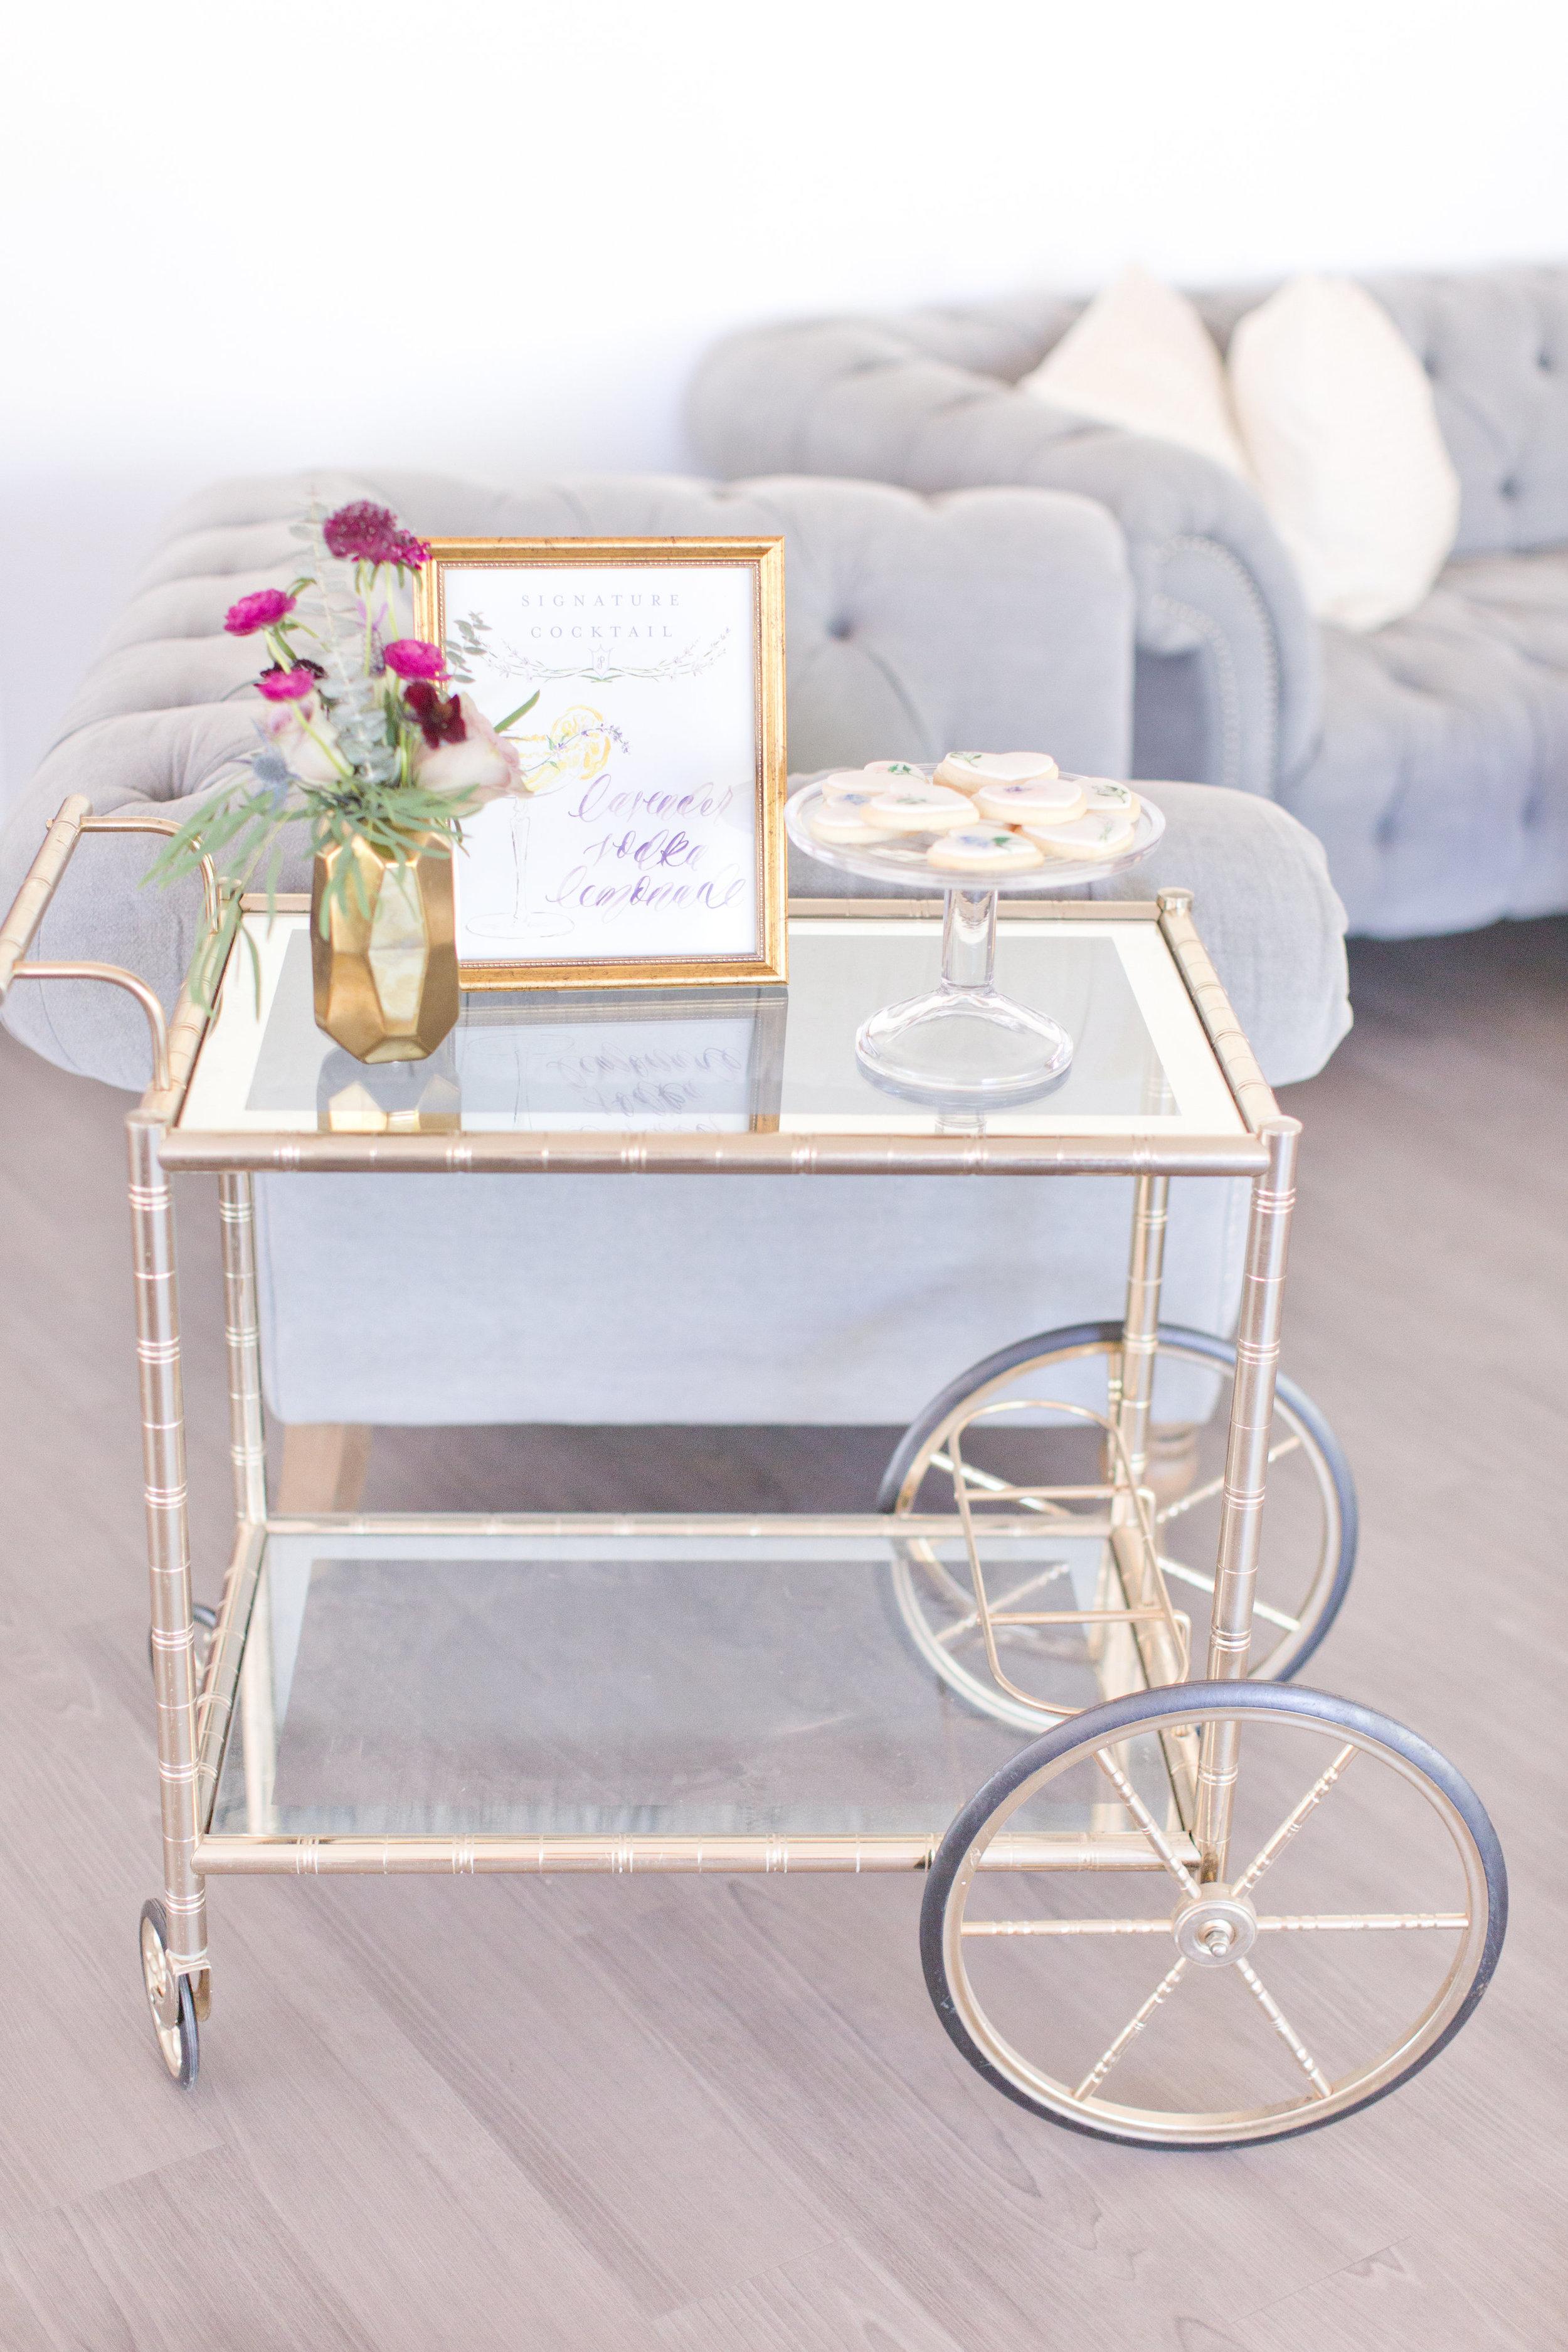 Amy & Jordan Workshop - Purple Anthropologie Inspired Wedding Lucite Bar Cart